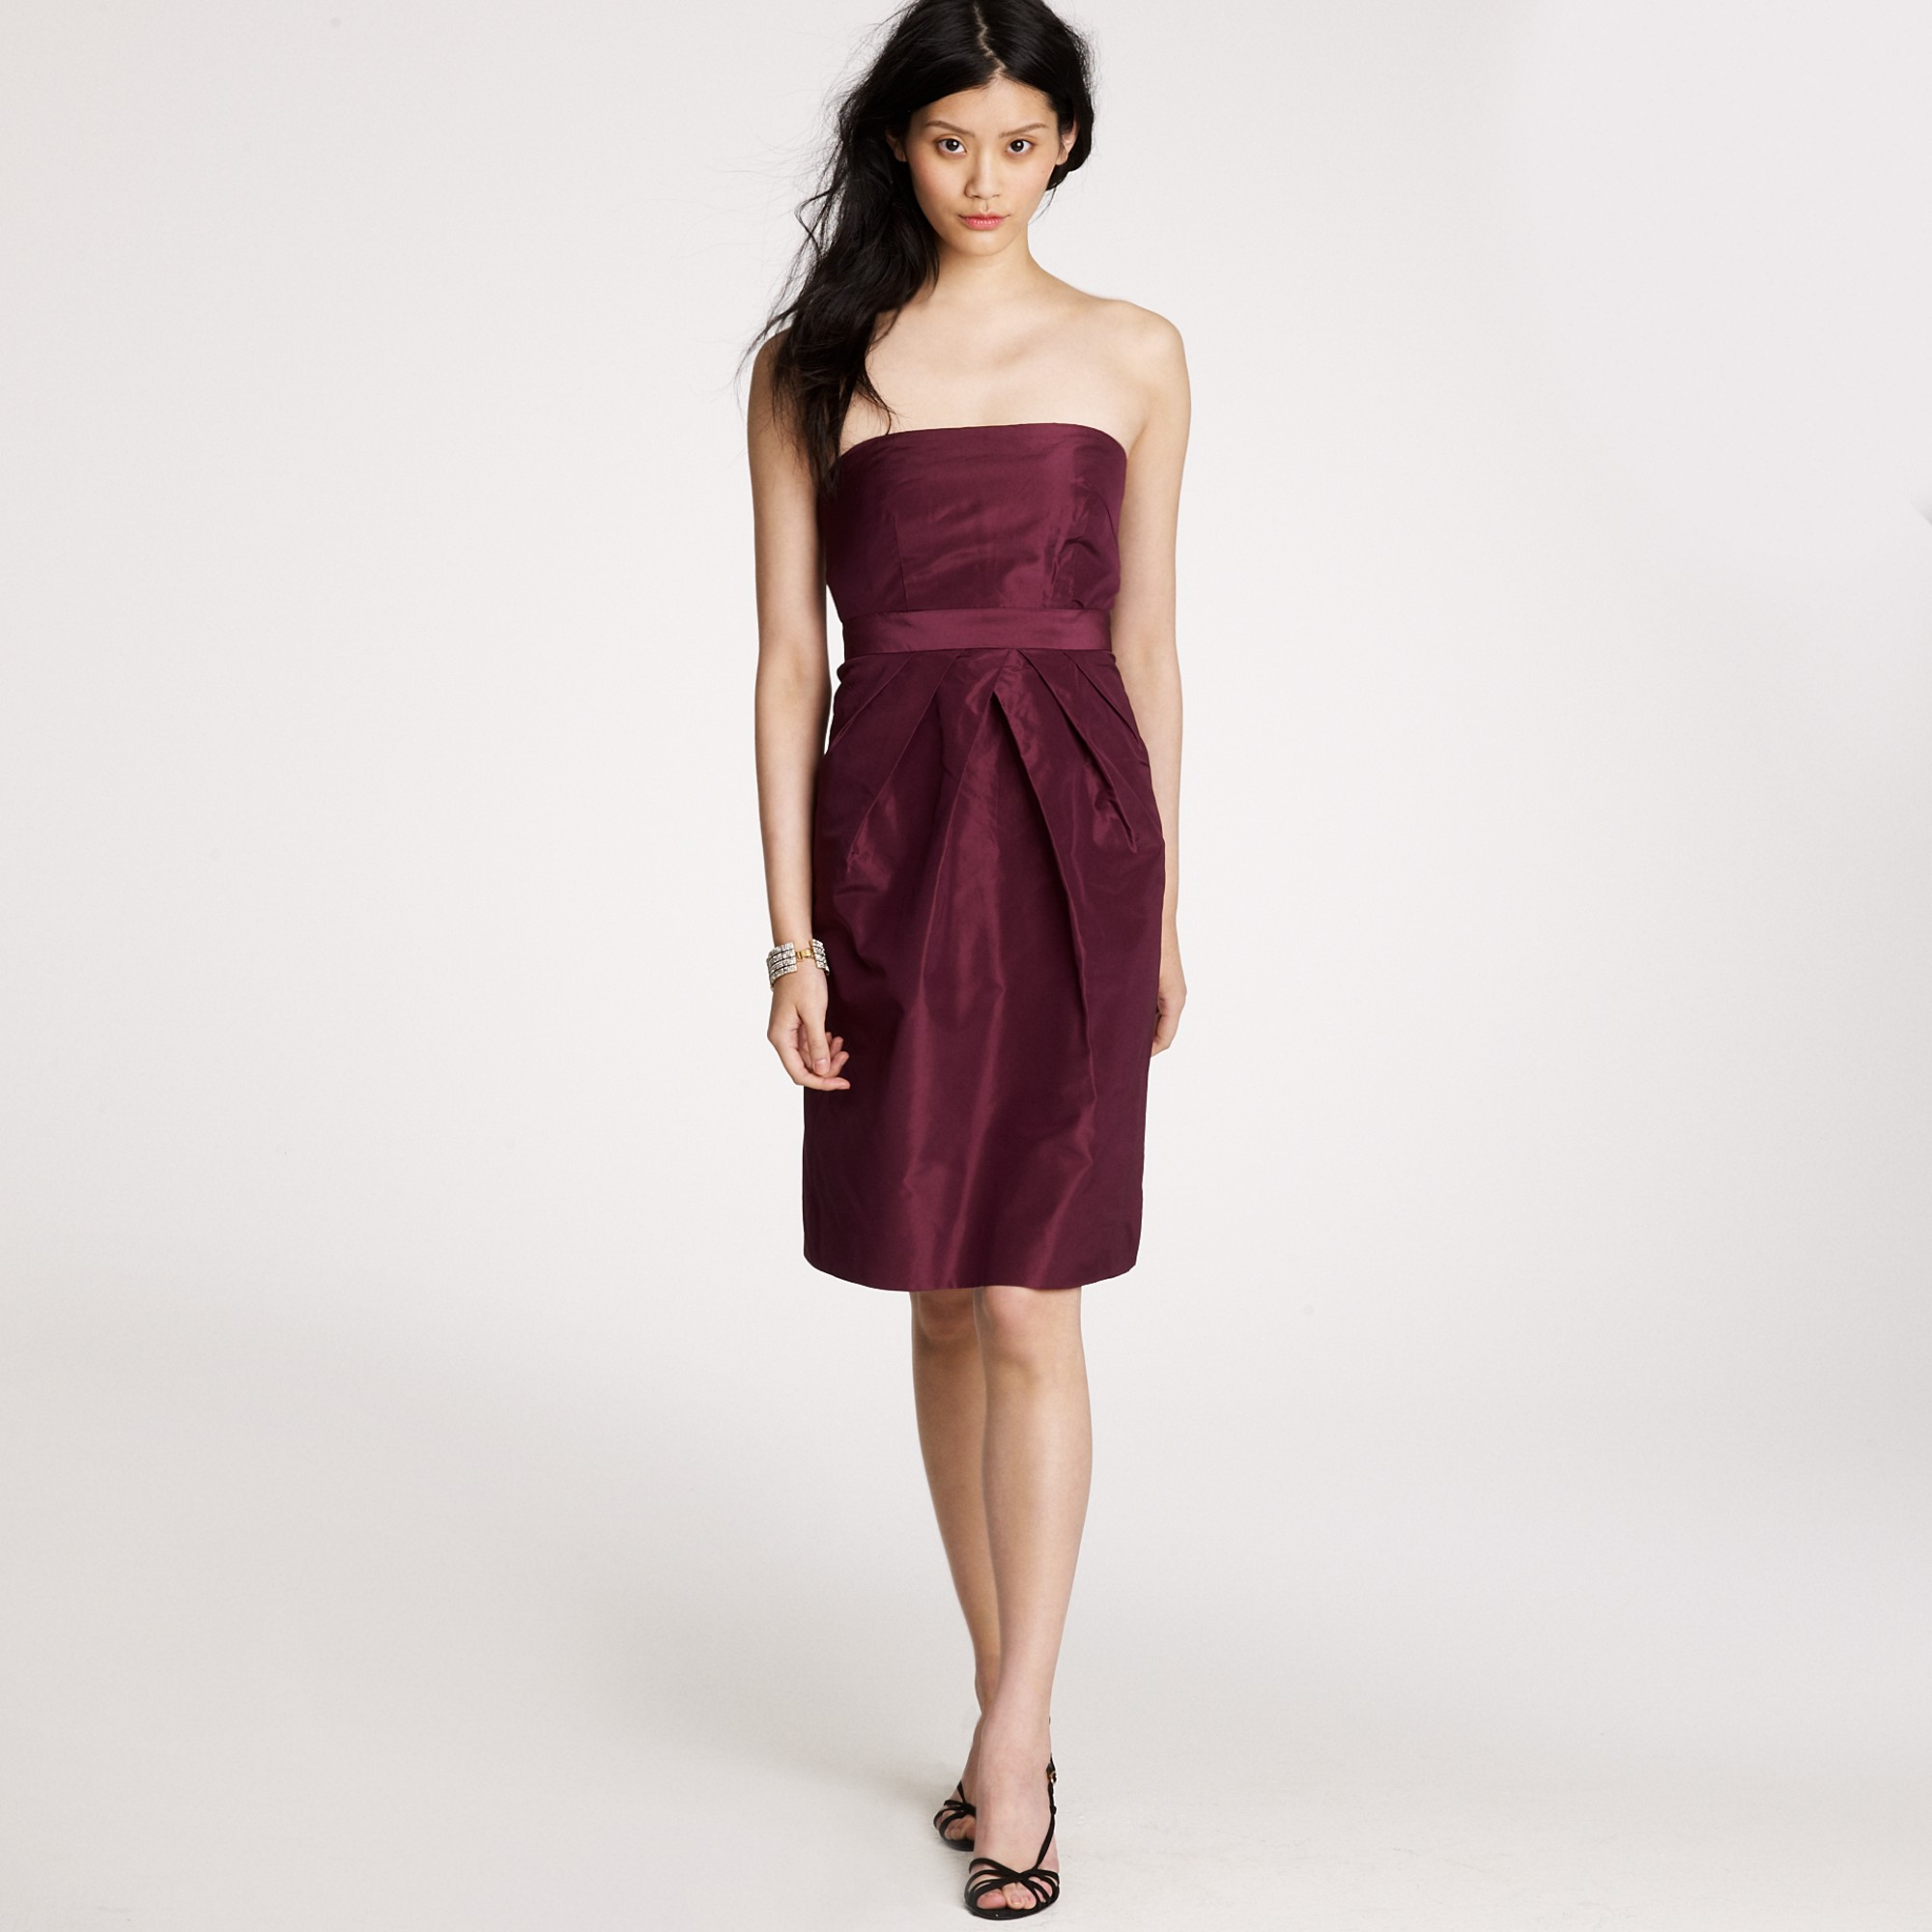 Adrienne Dress In Silk Taffeta: J.Crew Kayla Dress In Silk Taffeta In Red